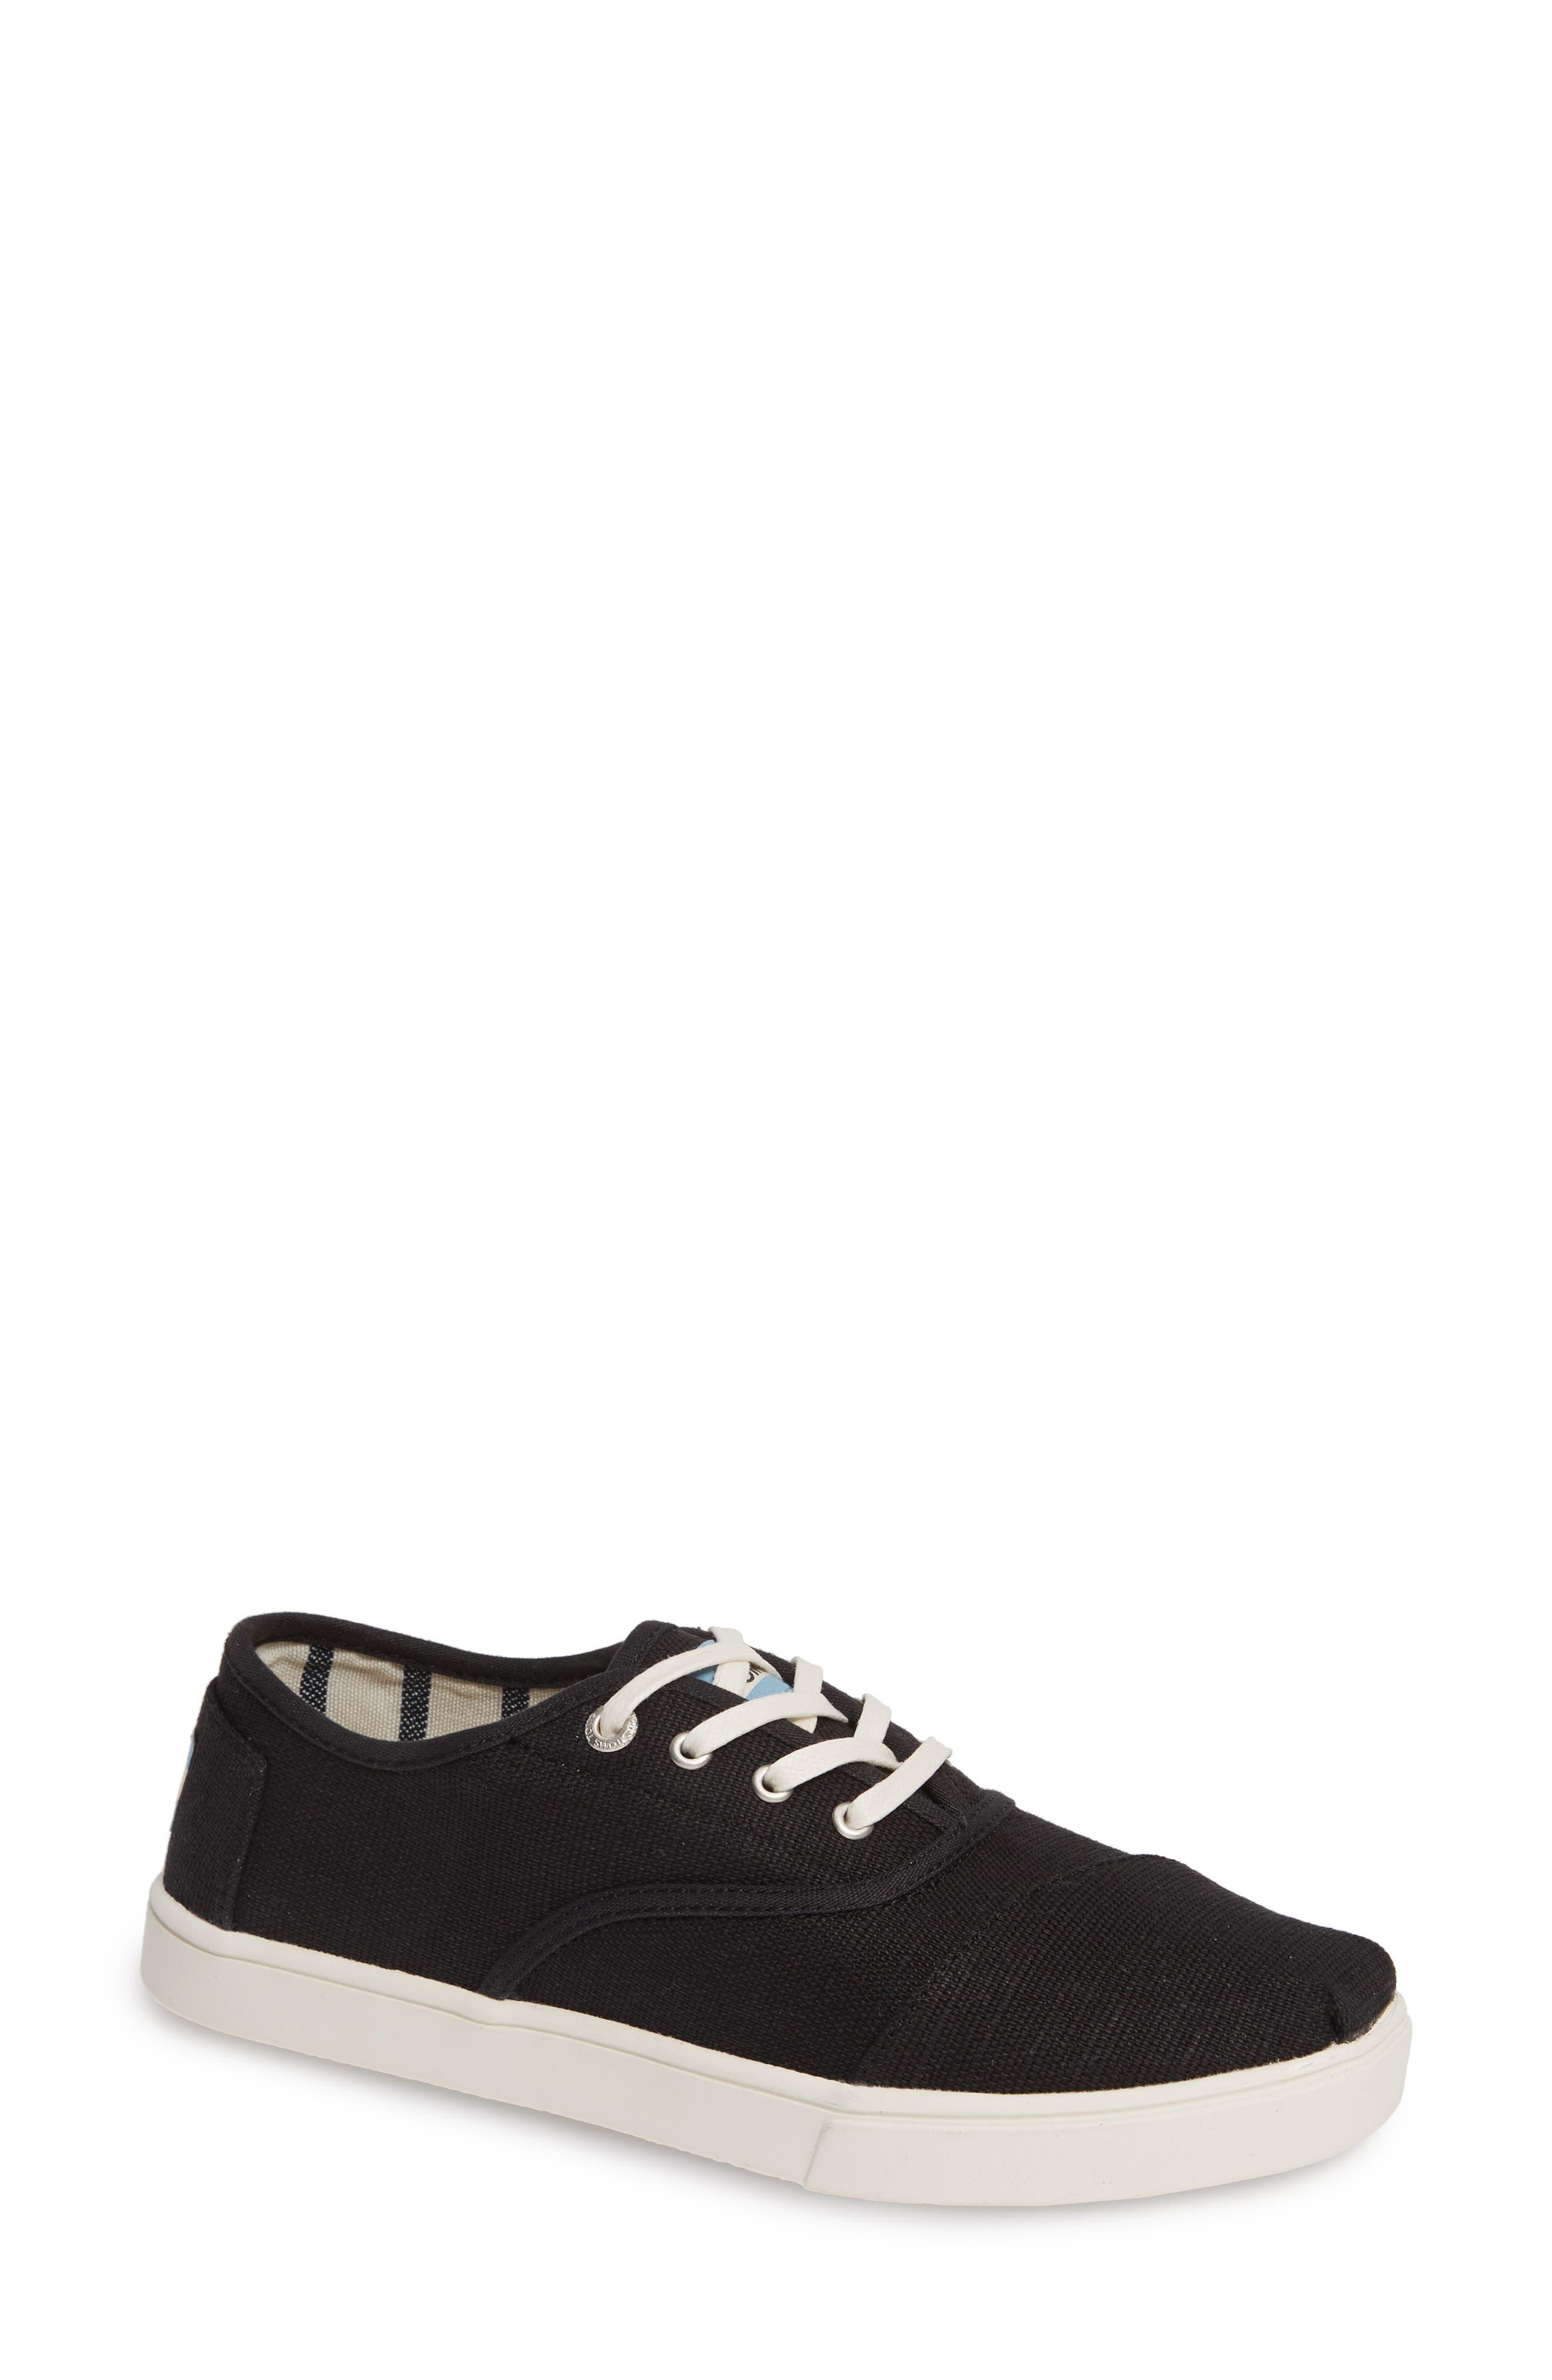 TOMS,                             Cordones Sneaker,                             Main thumbnail 1, color,                             BLACK HERITAGE CANVAS